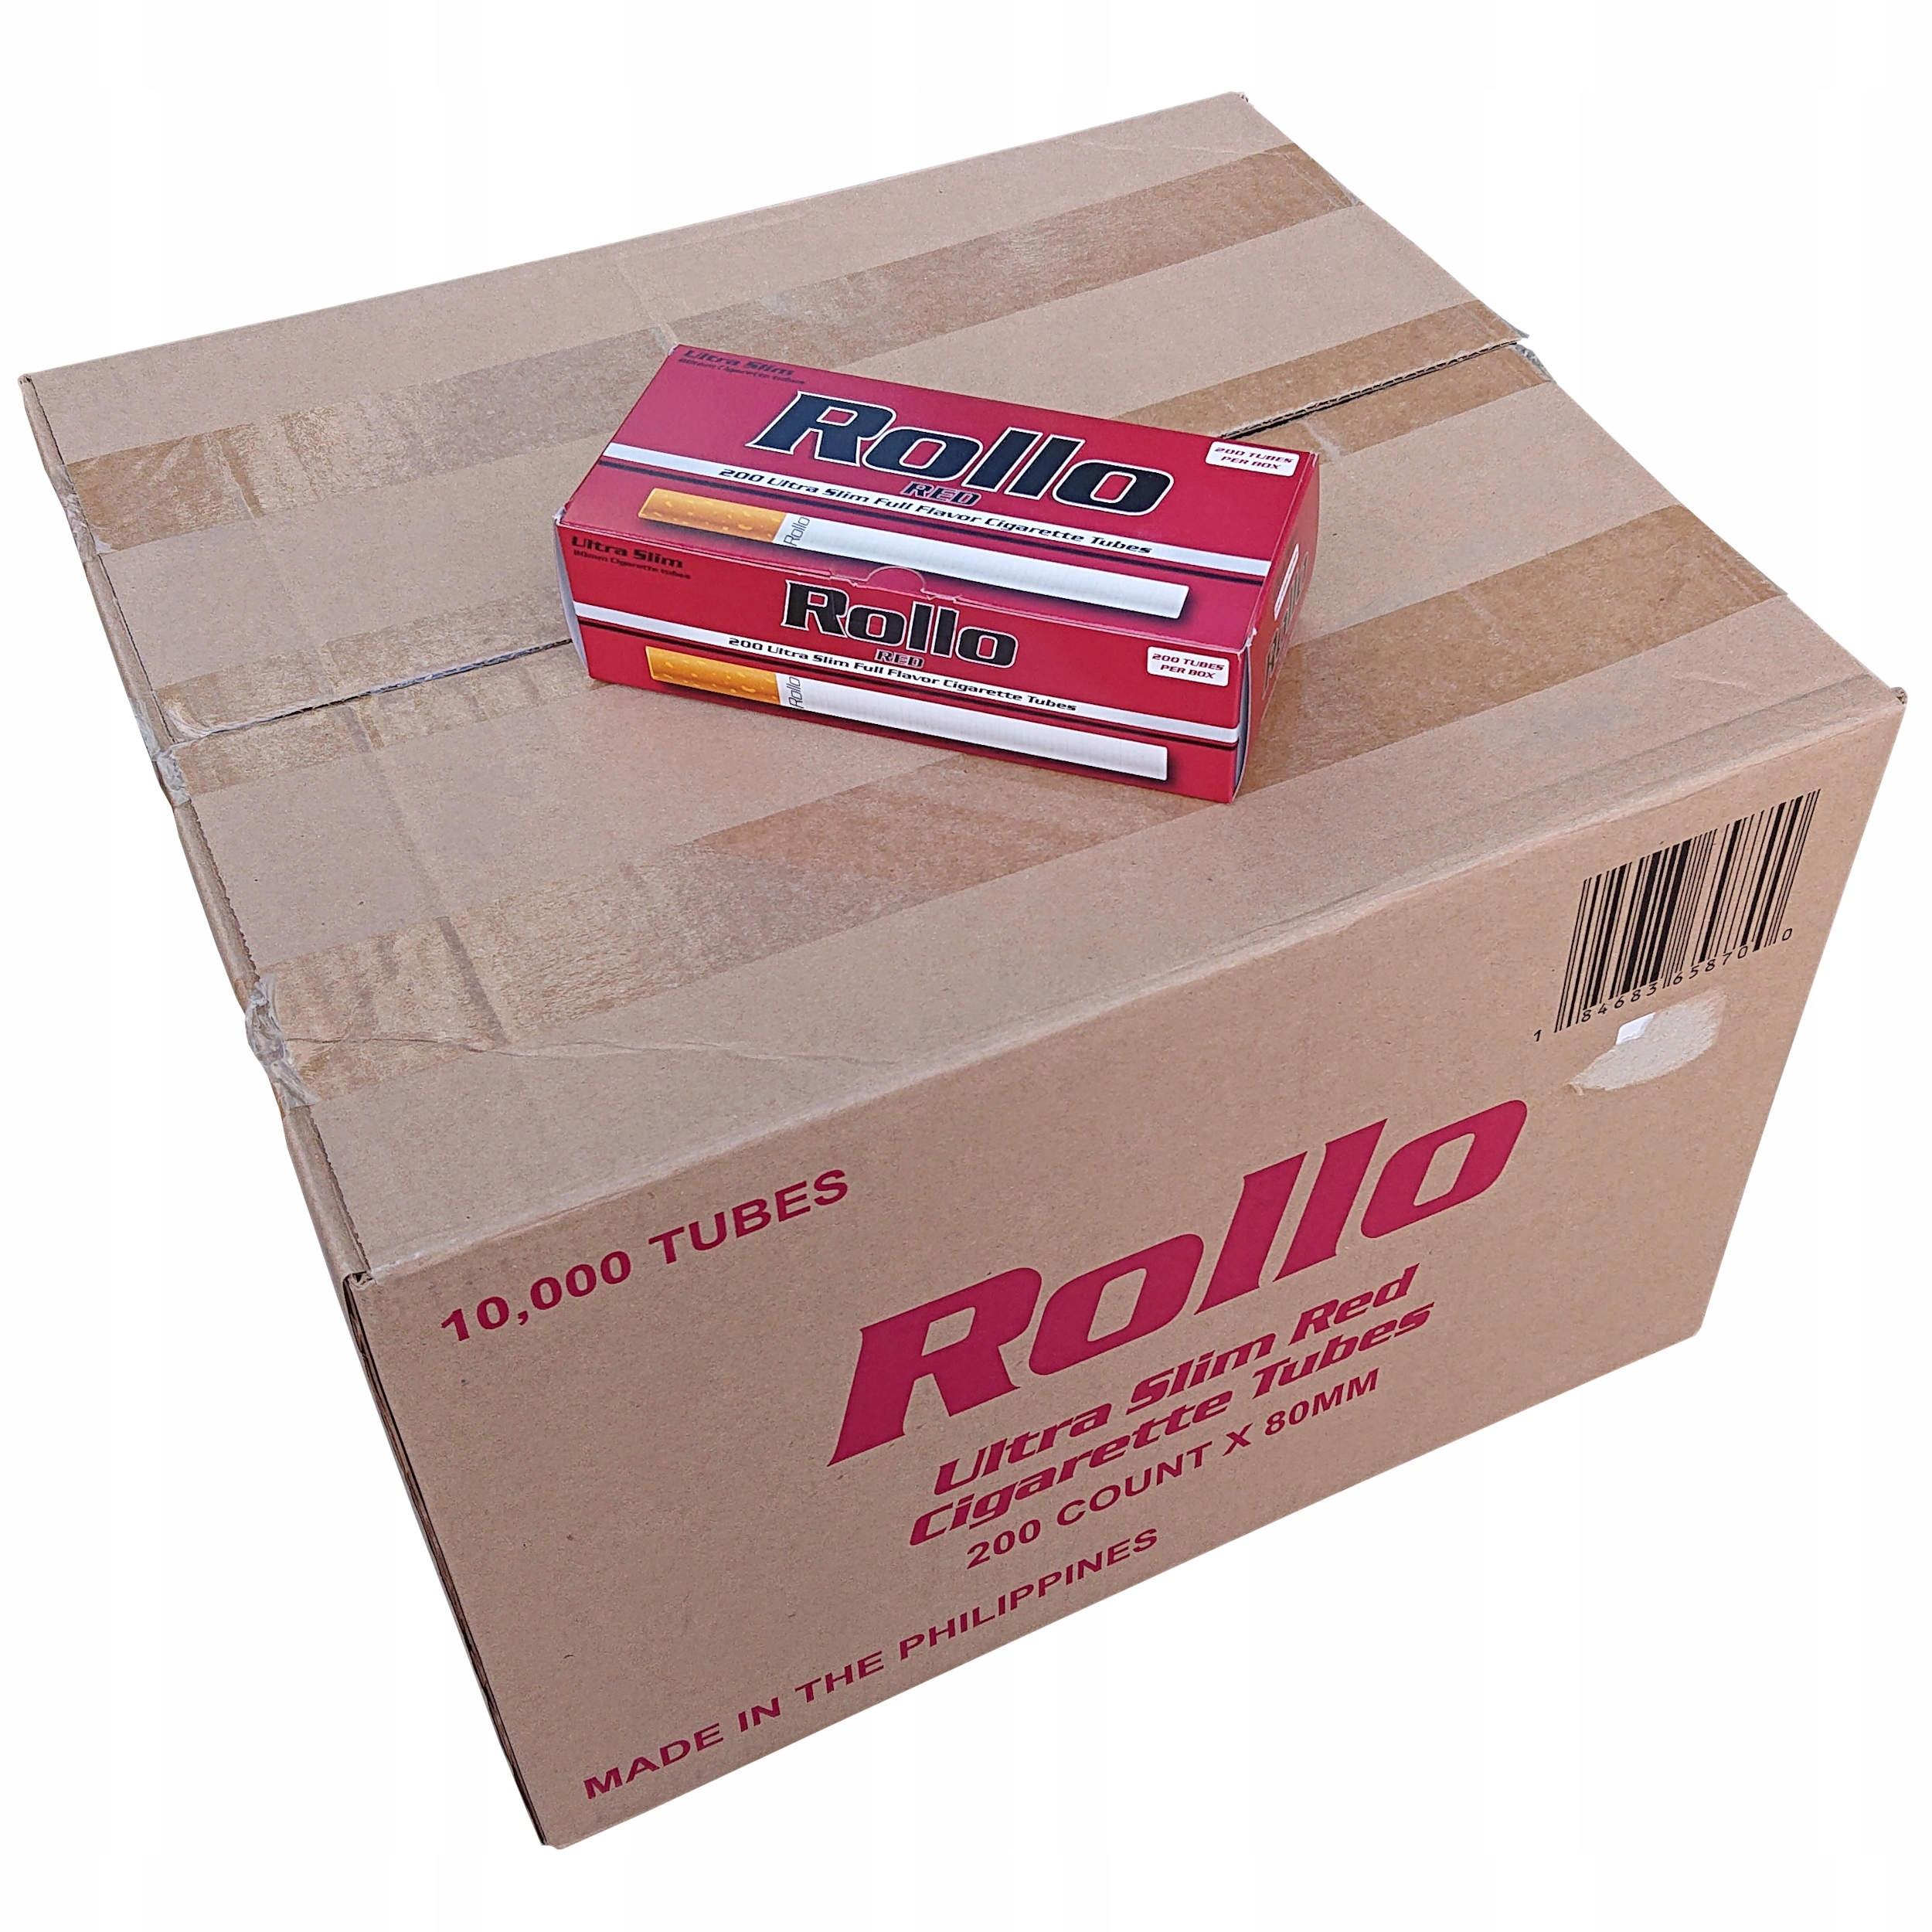 50 x наперсток Ролло ультра тонкий красный 200 шт 6,5 мм EAN 184683658700